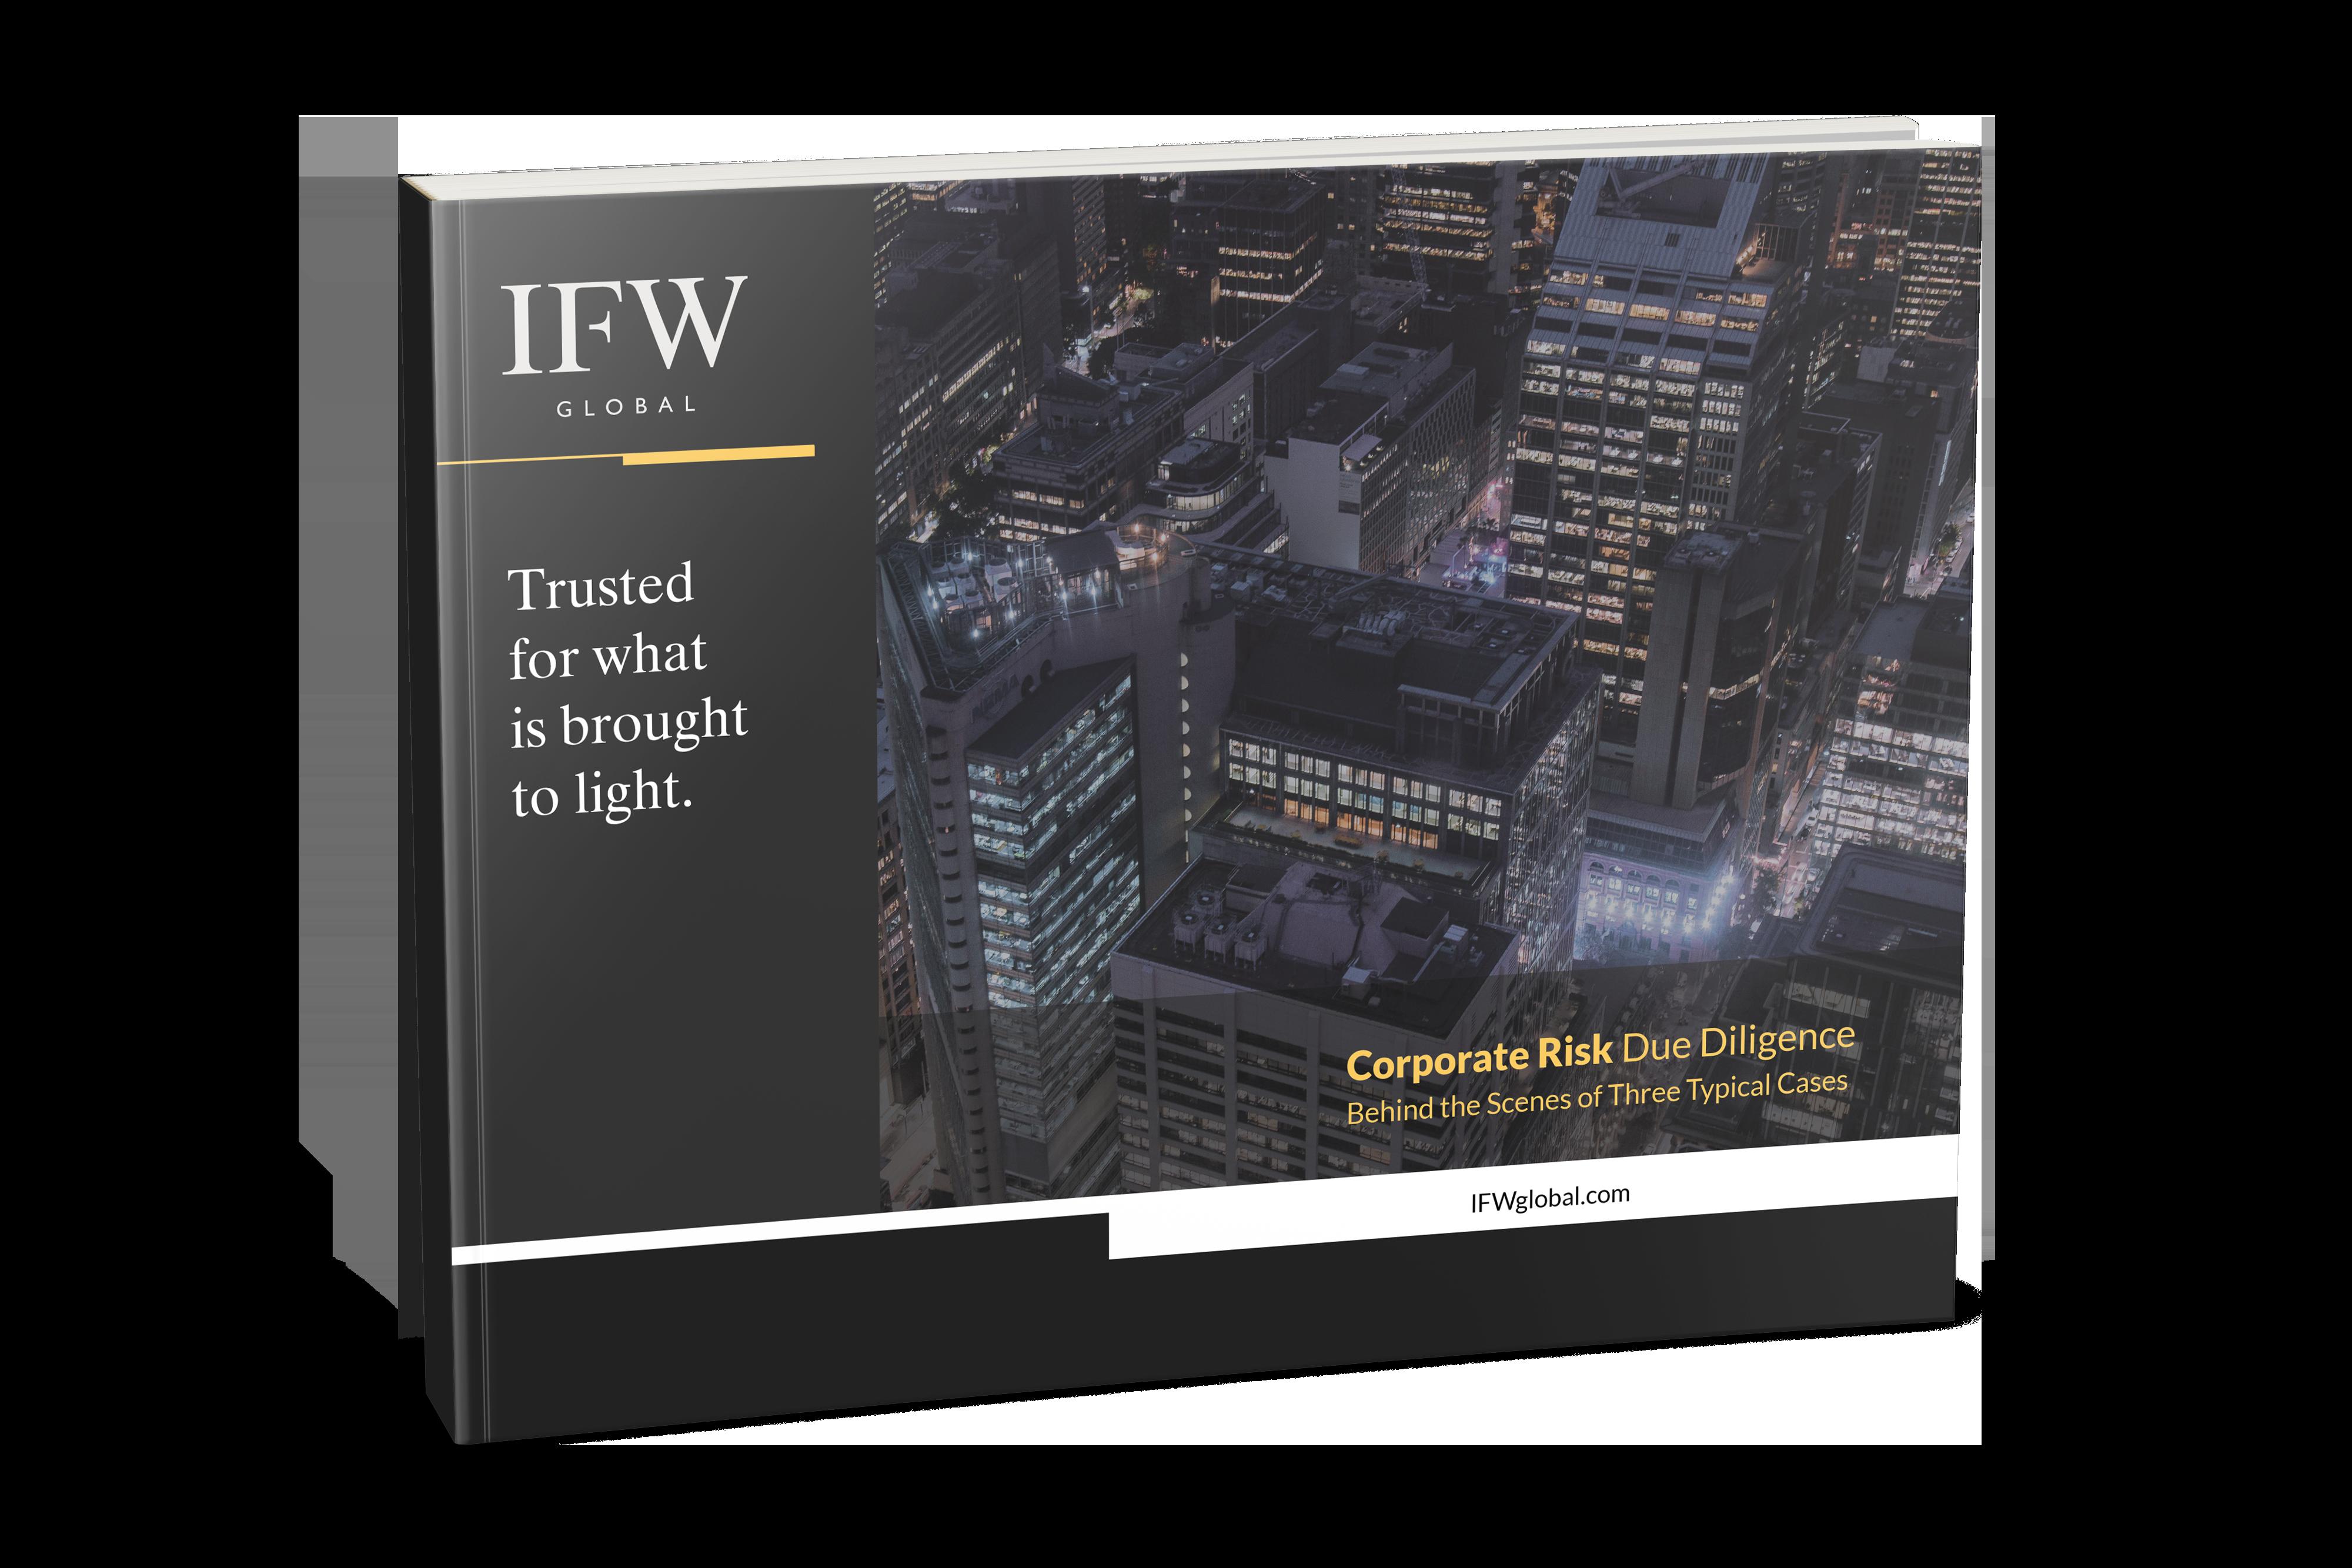 Corporate Risk Due Diligence eBook Mockup 2